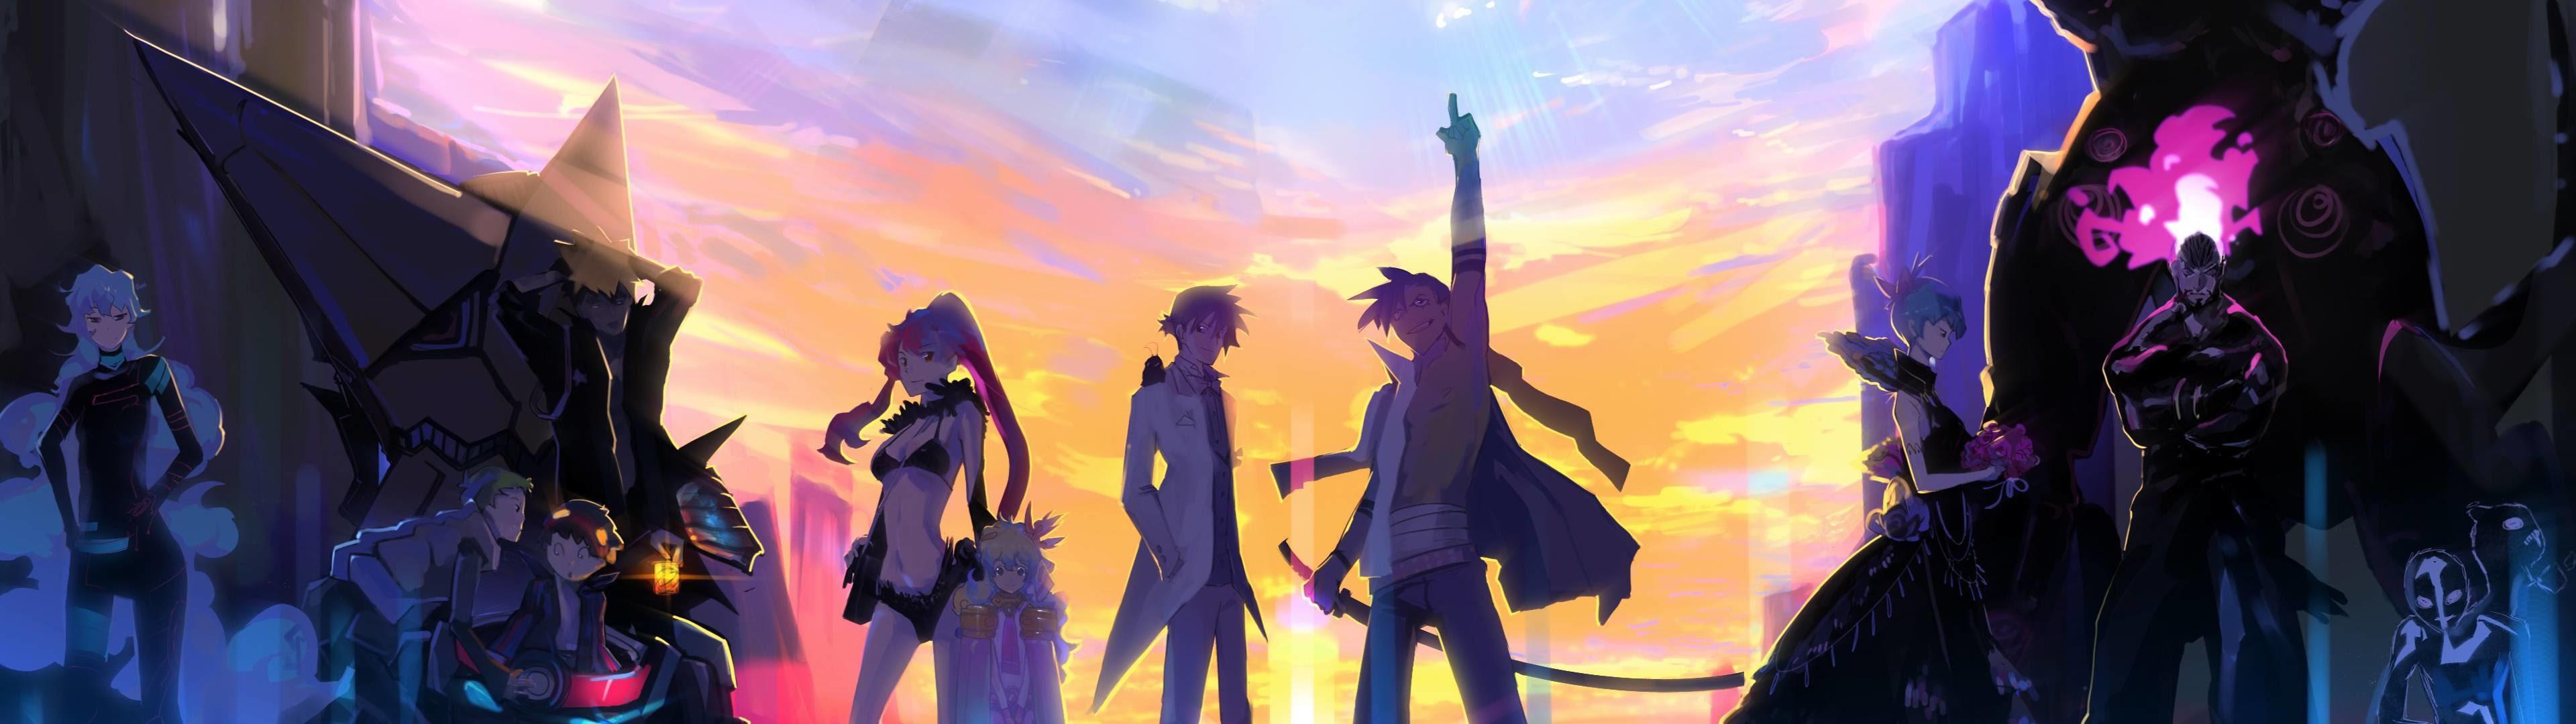 27 Dual Desktop Anime Wallpaper Anime Wallpaper